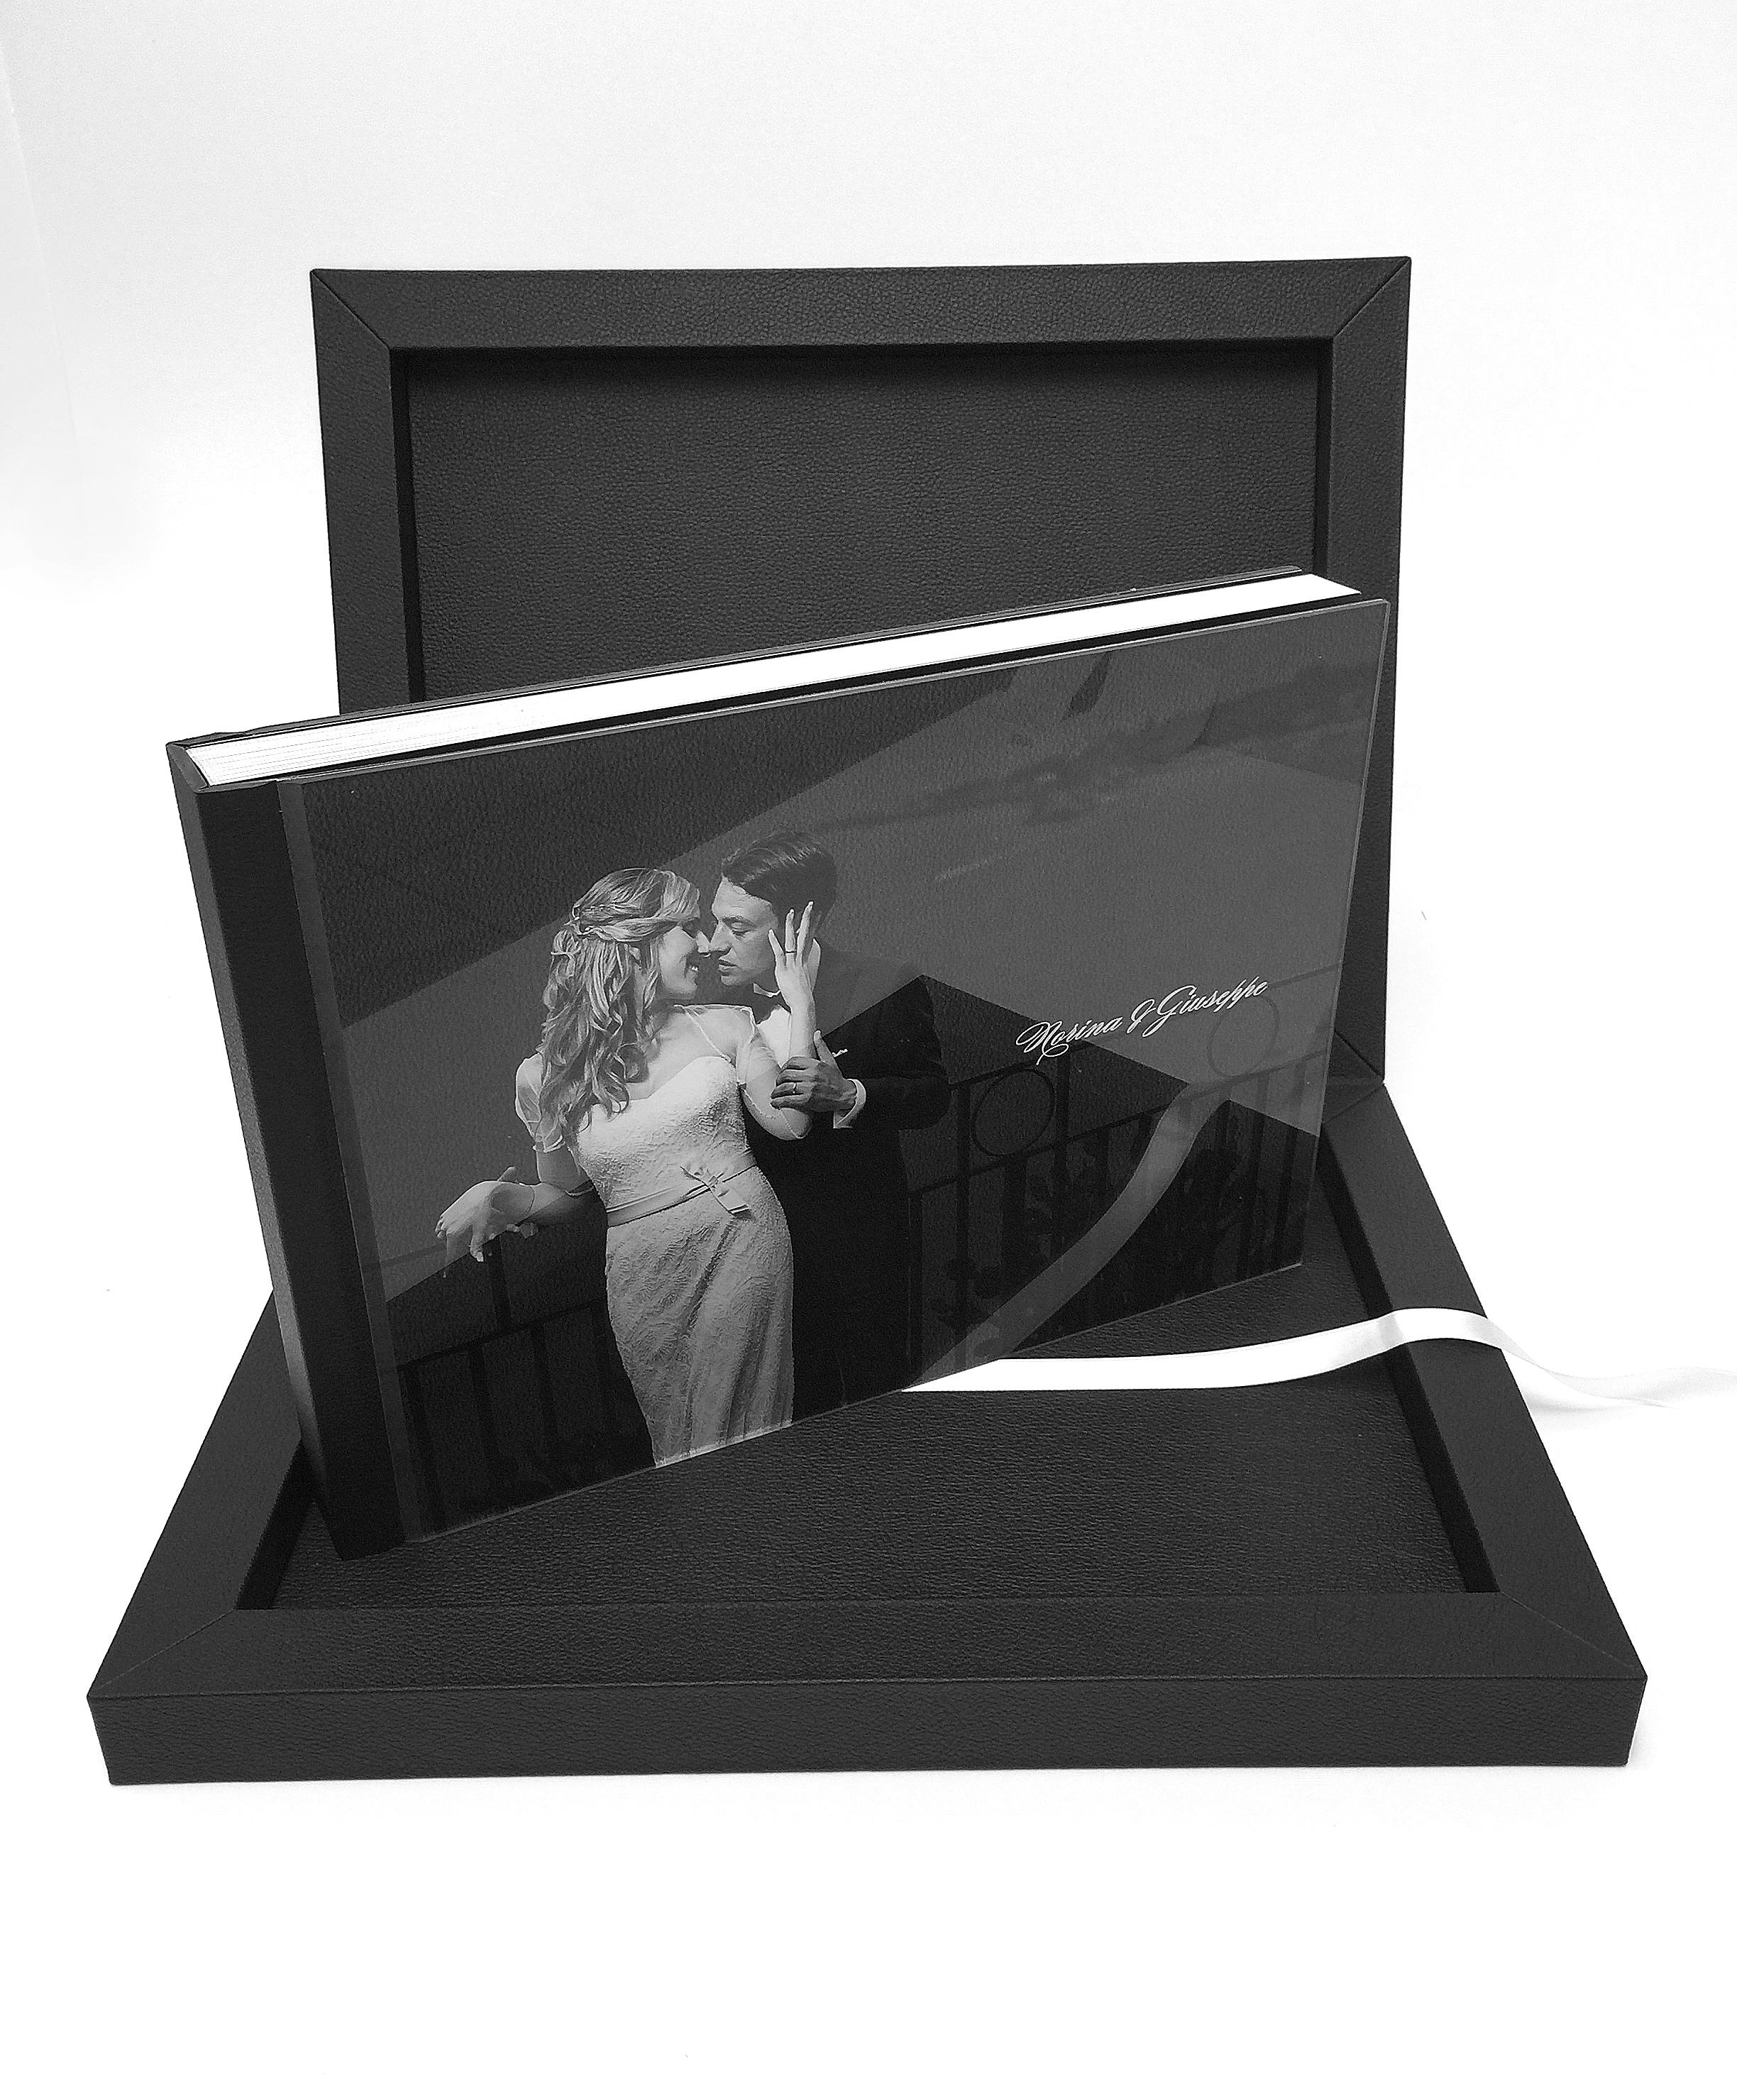 Crystal Glance Cover (Fotoafdruk op acryl)